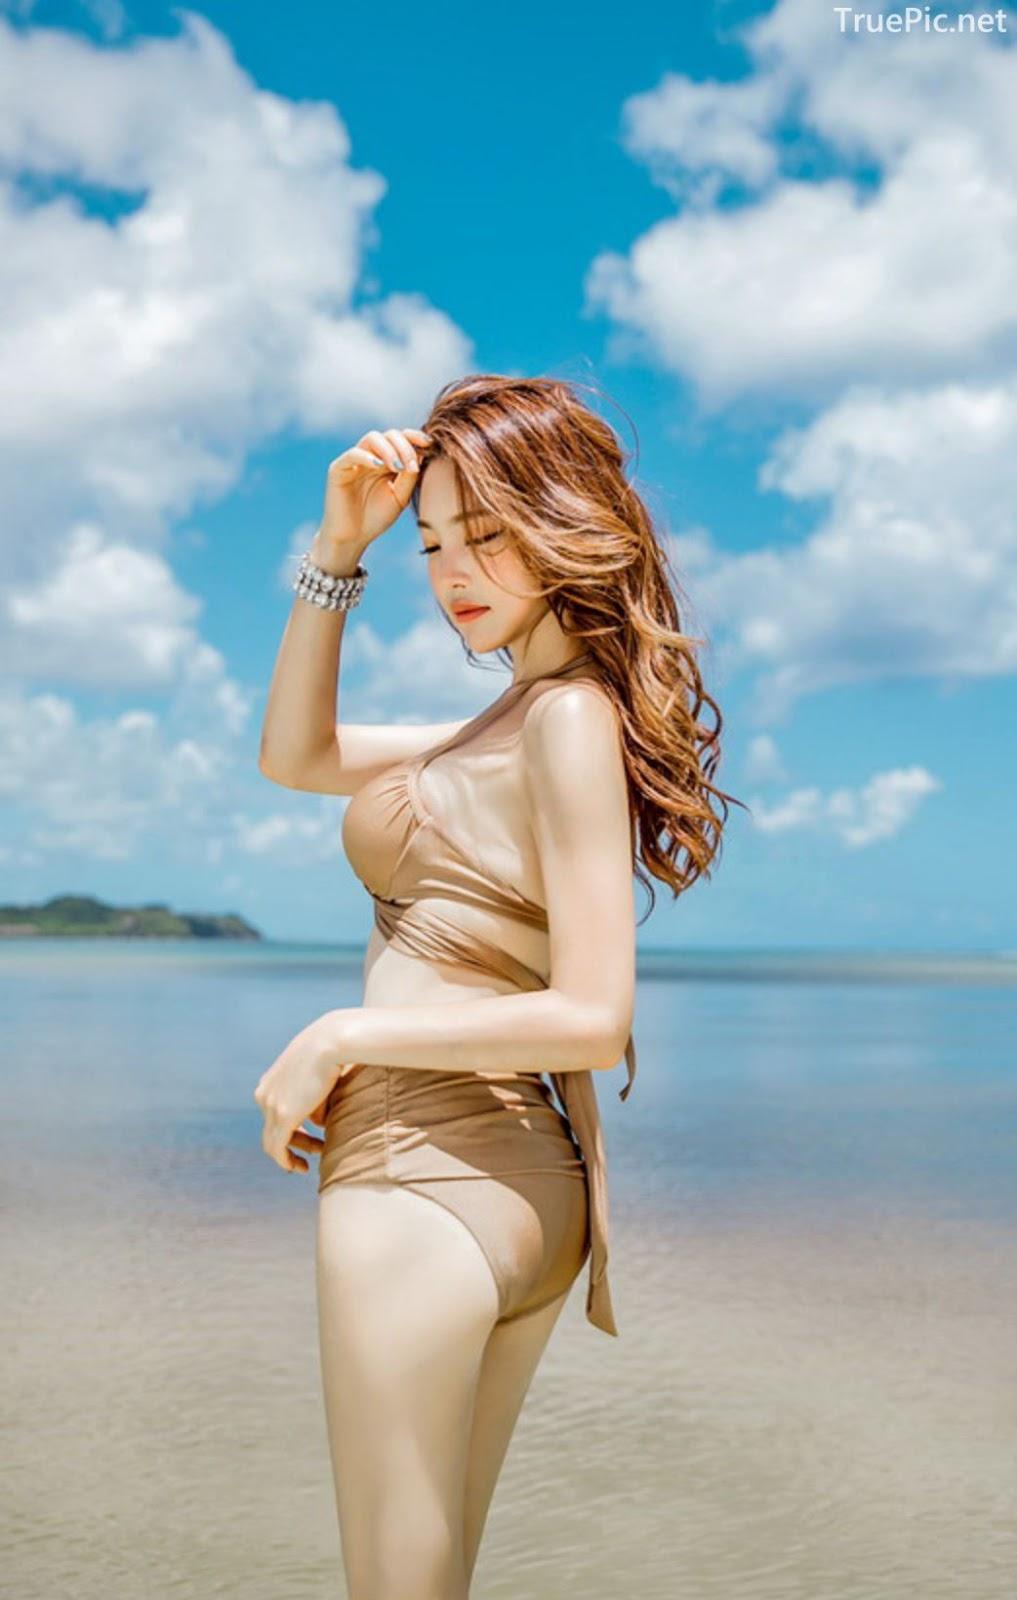 The Korean Model With Bikini !!! Korean Girl !!! Hot Video